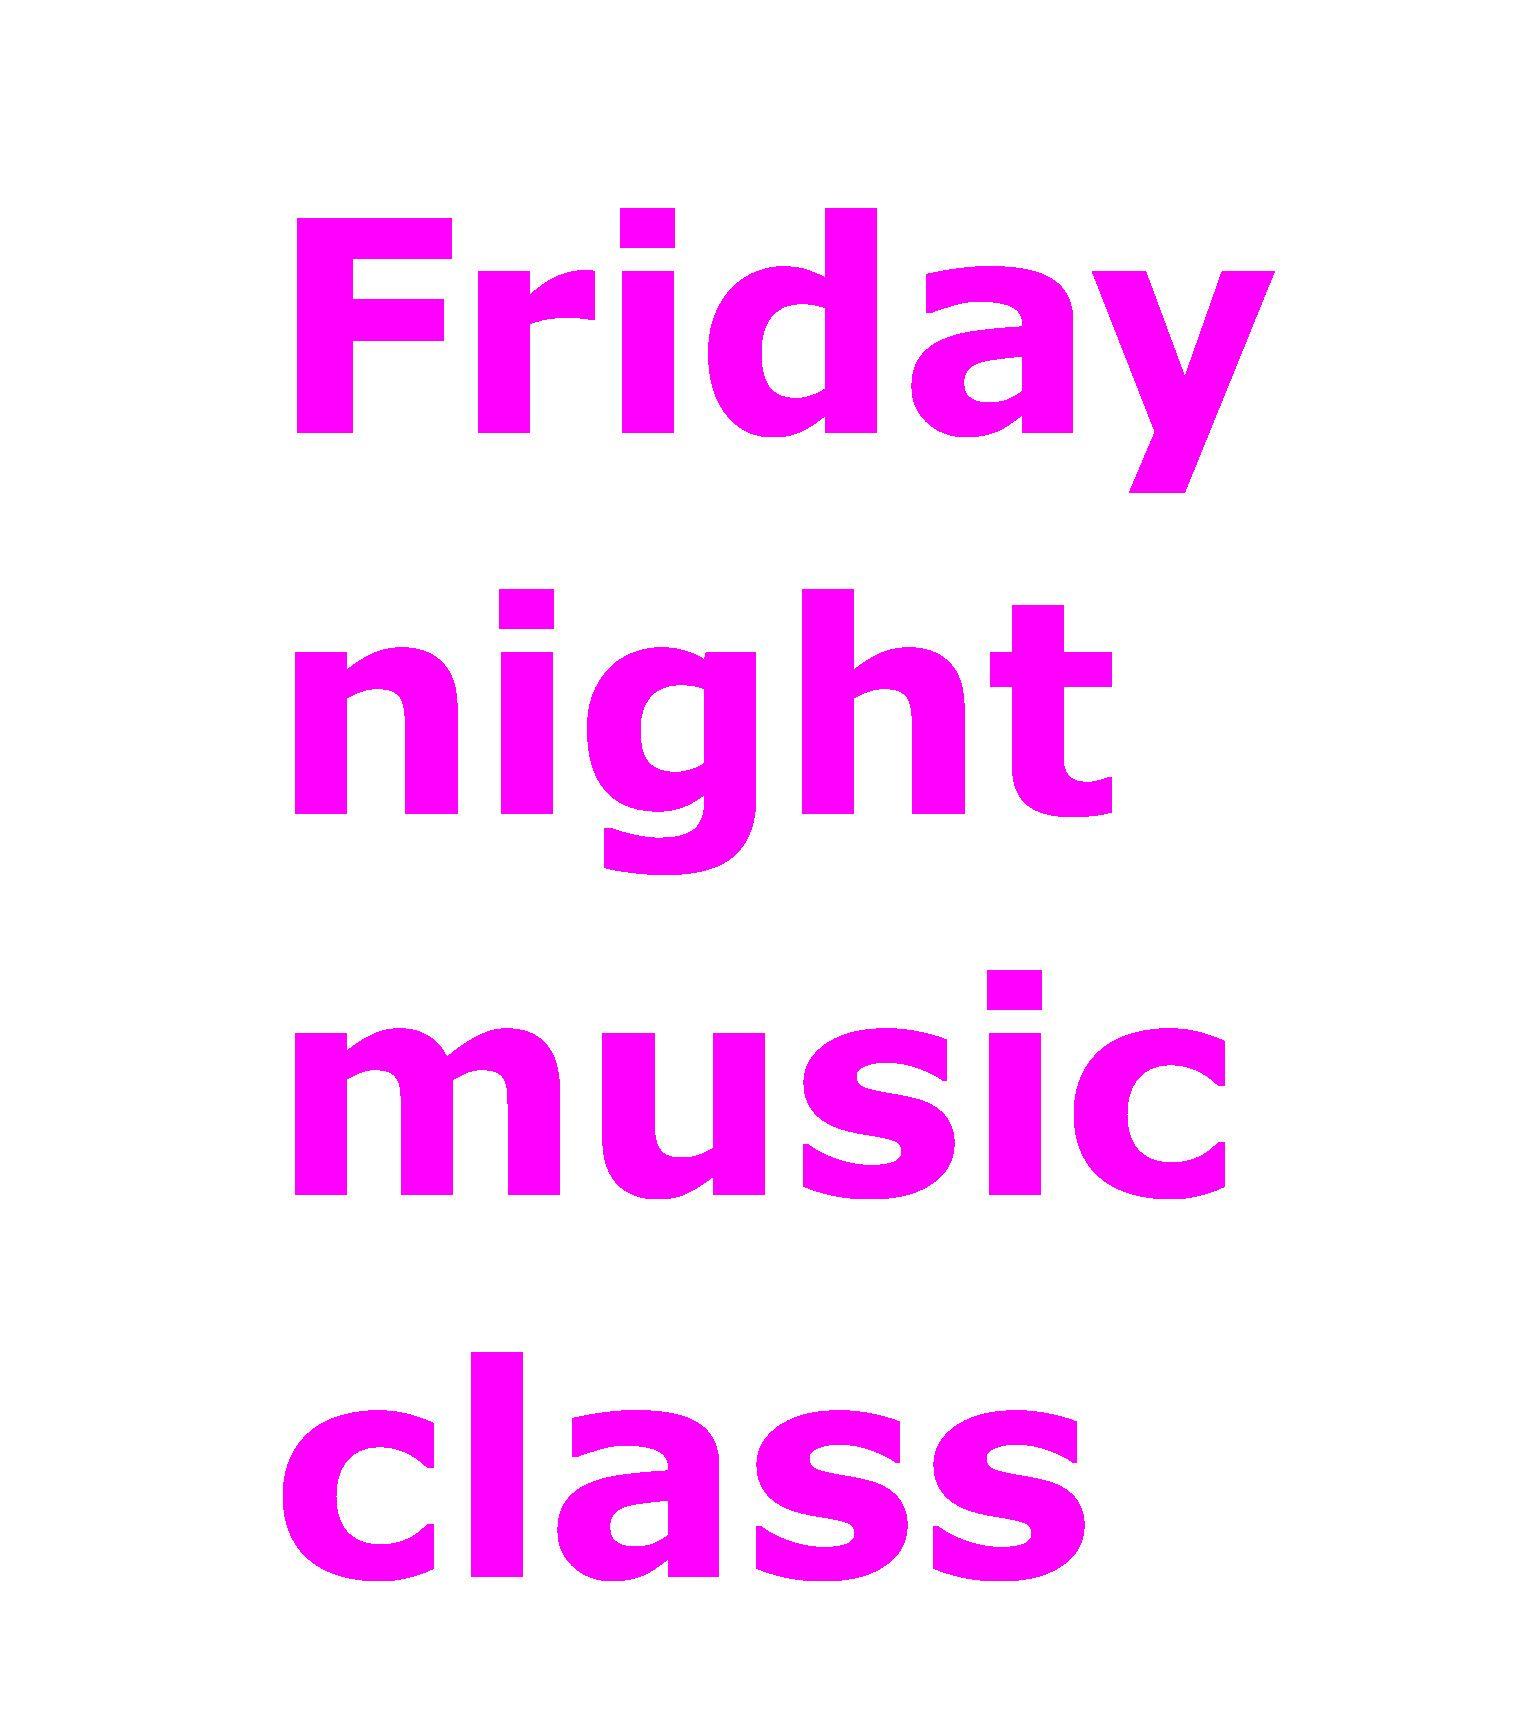 Friday night music class